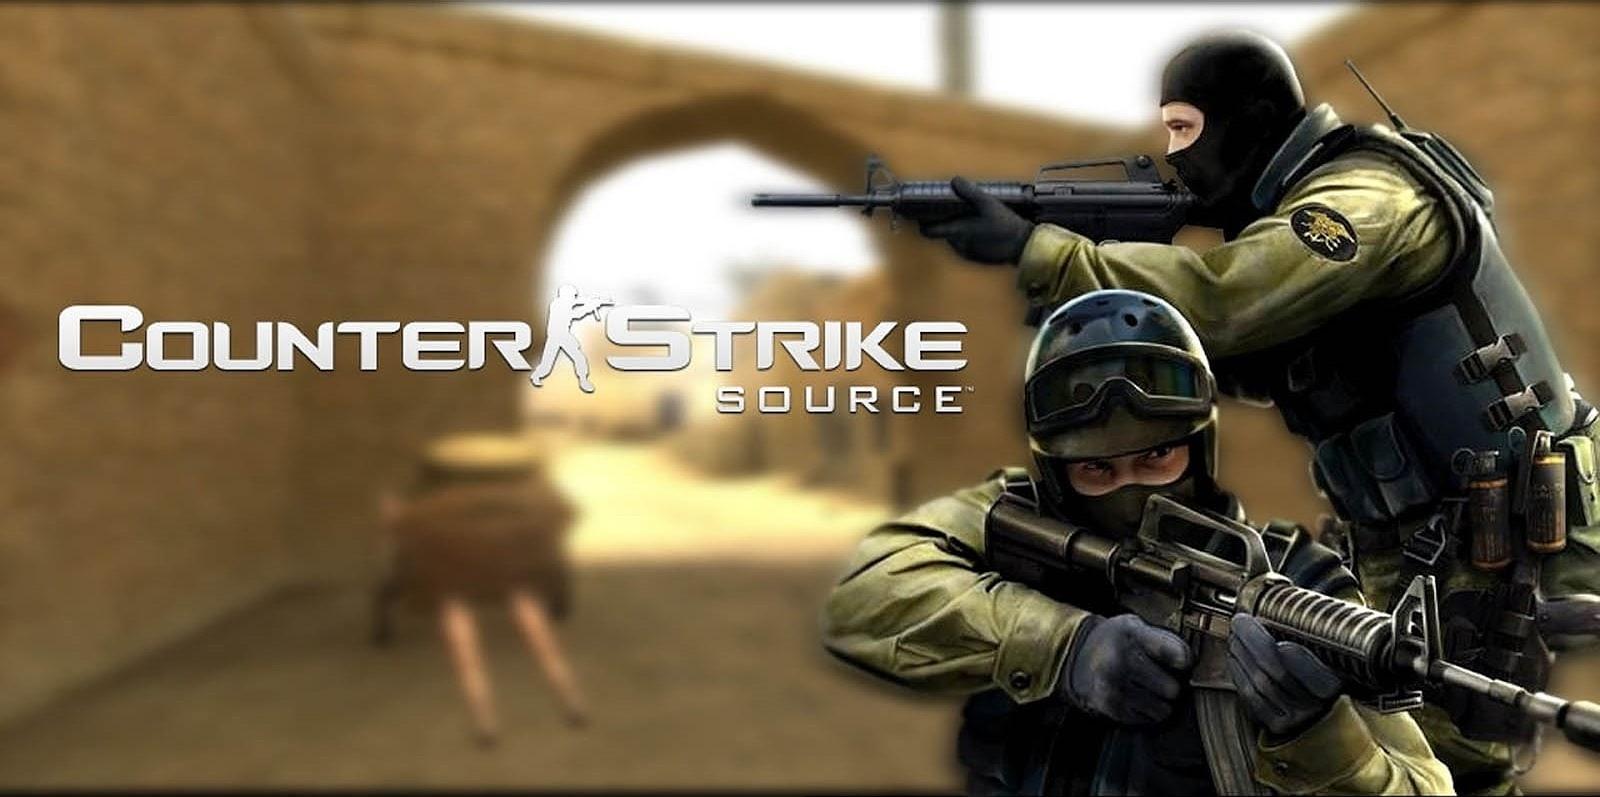 Counter Strike Source Free Download Pc Full Version Gamingzparadise